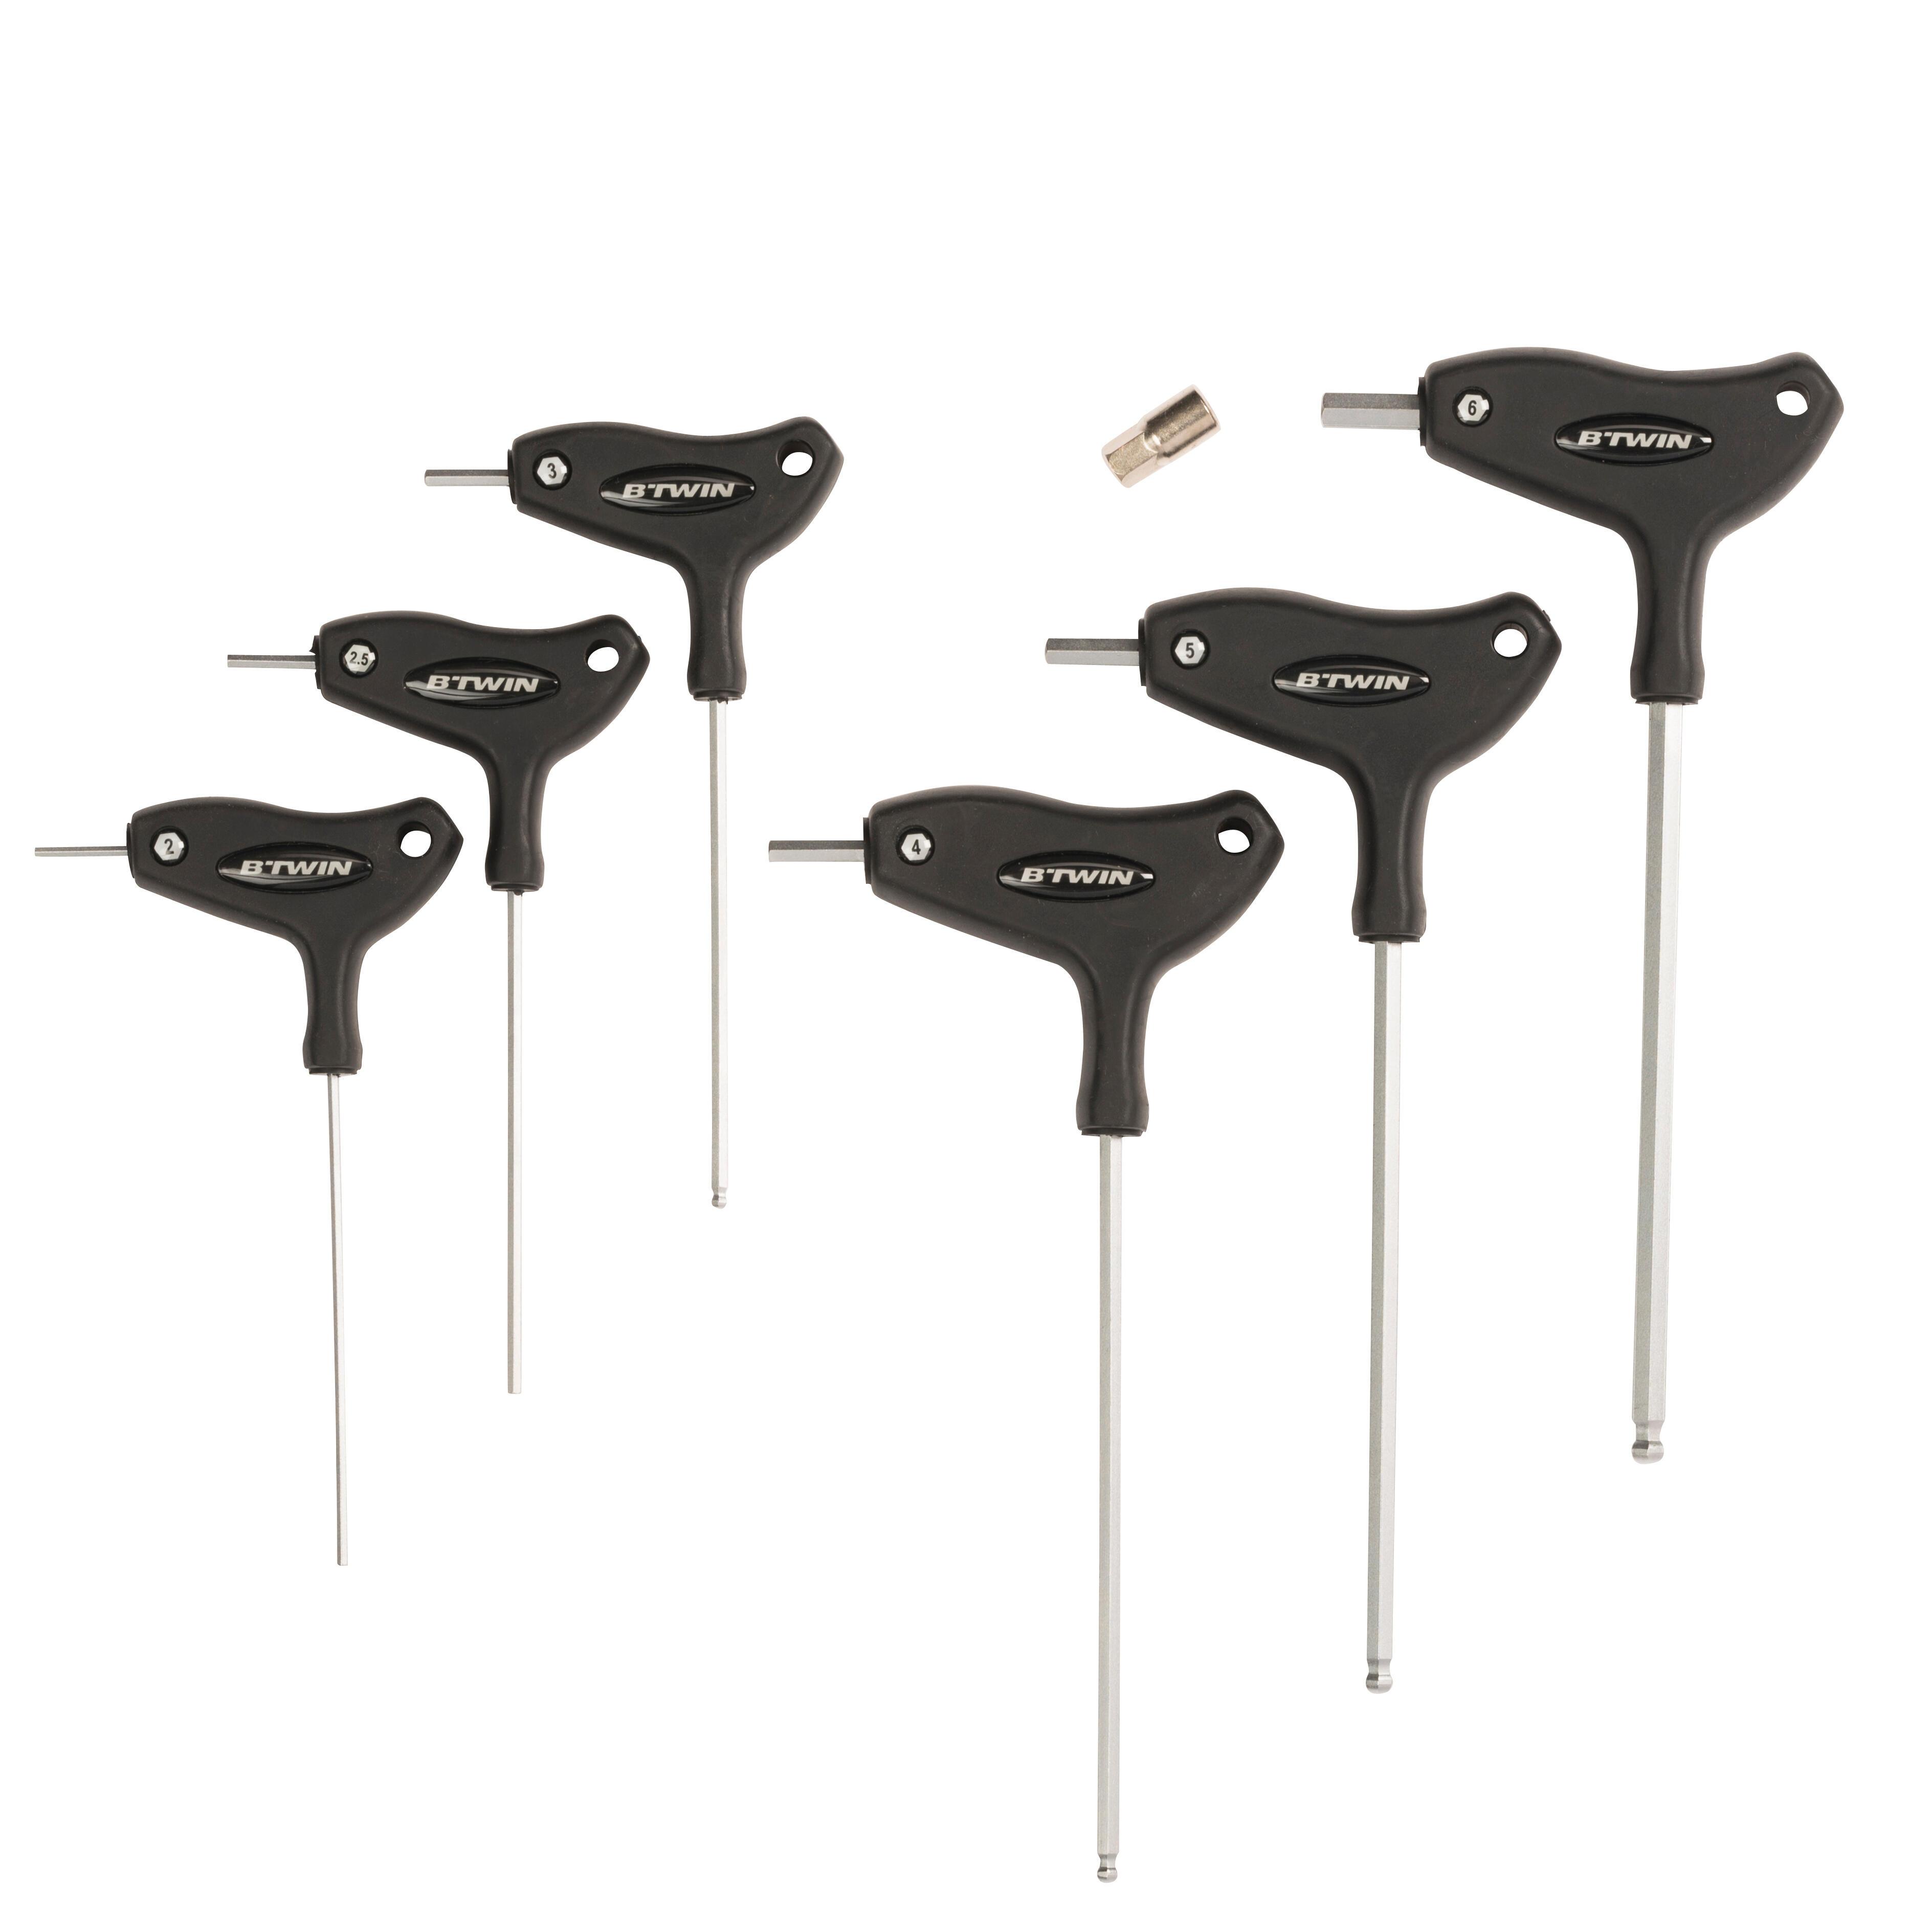 Decathlon Serie 6 chiavi allen + adattatore 8mm